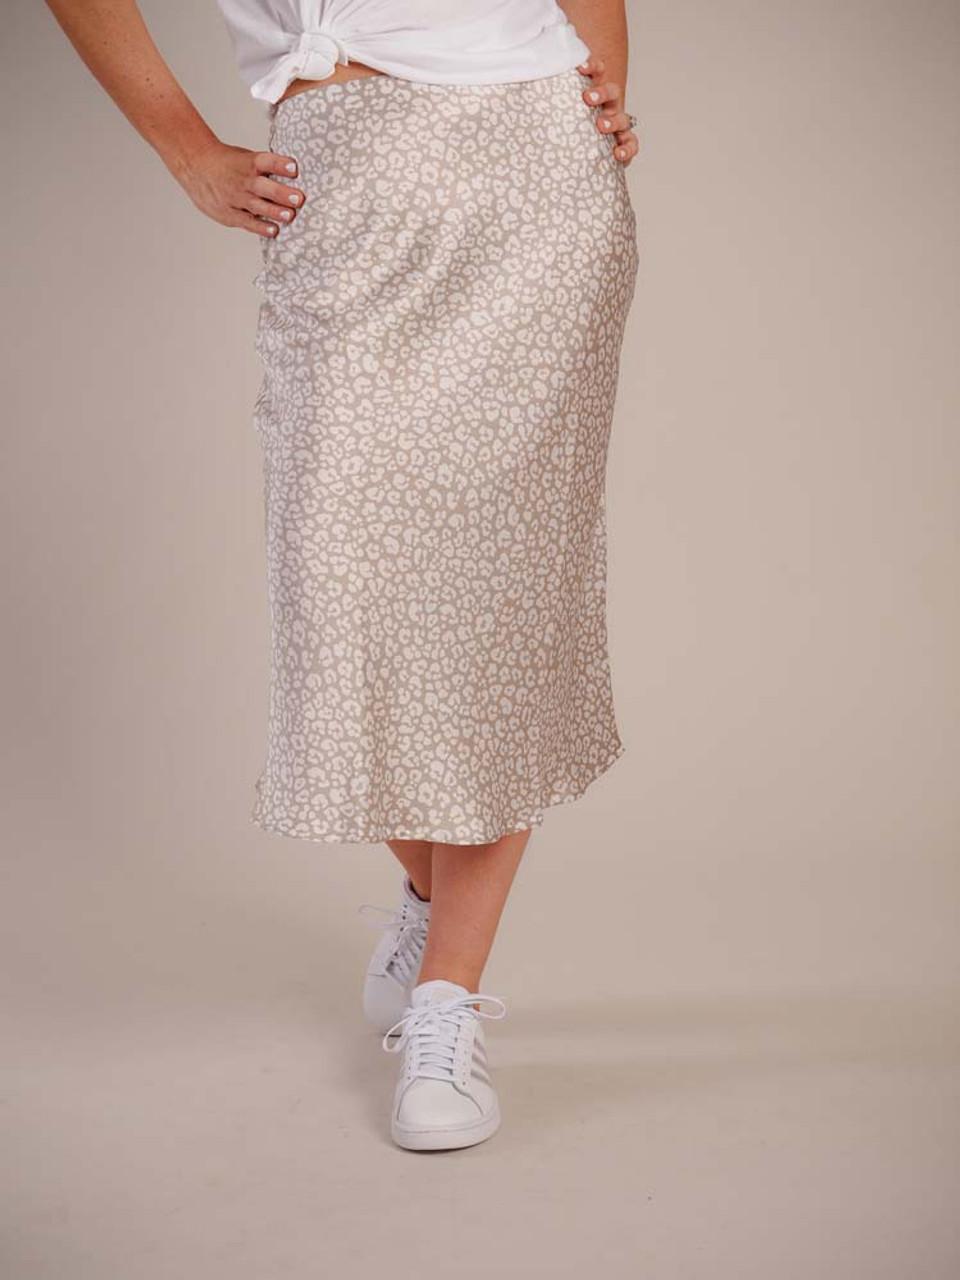 mudpie midi skirt taupe and cram leopard print